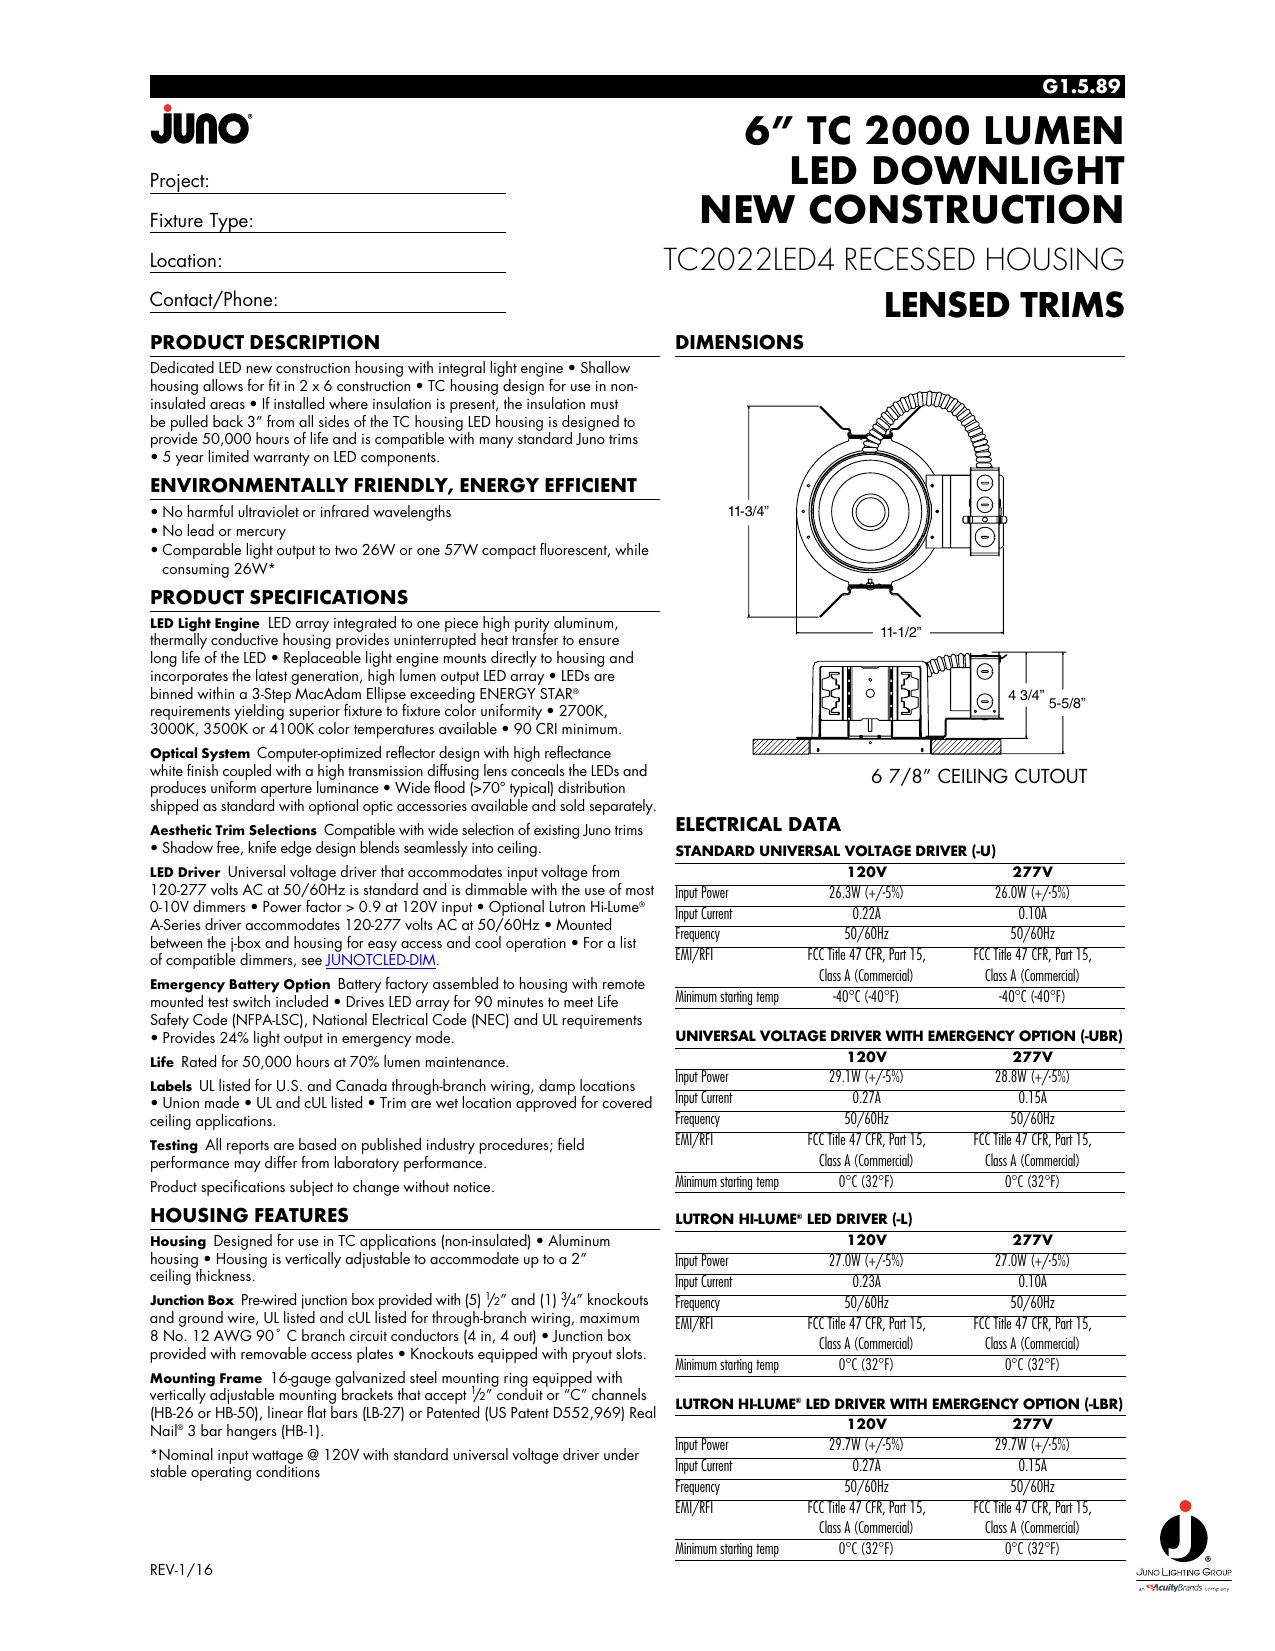 "6"" tc 2000 lumen led downlight new construction | manualzz com"